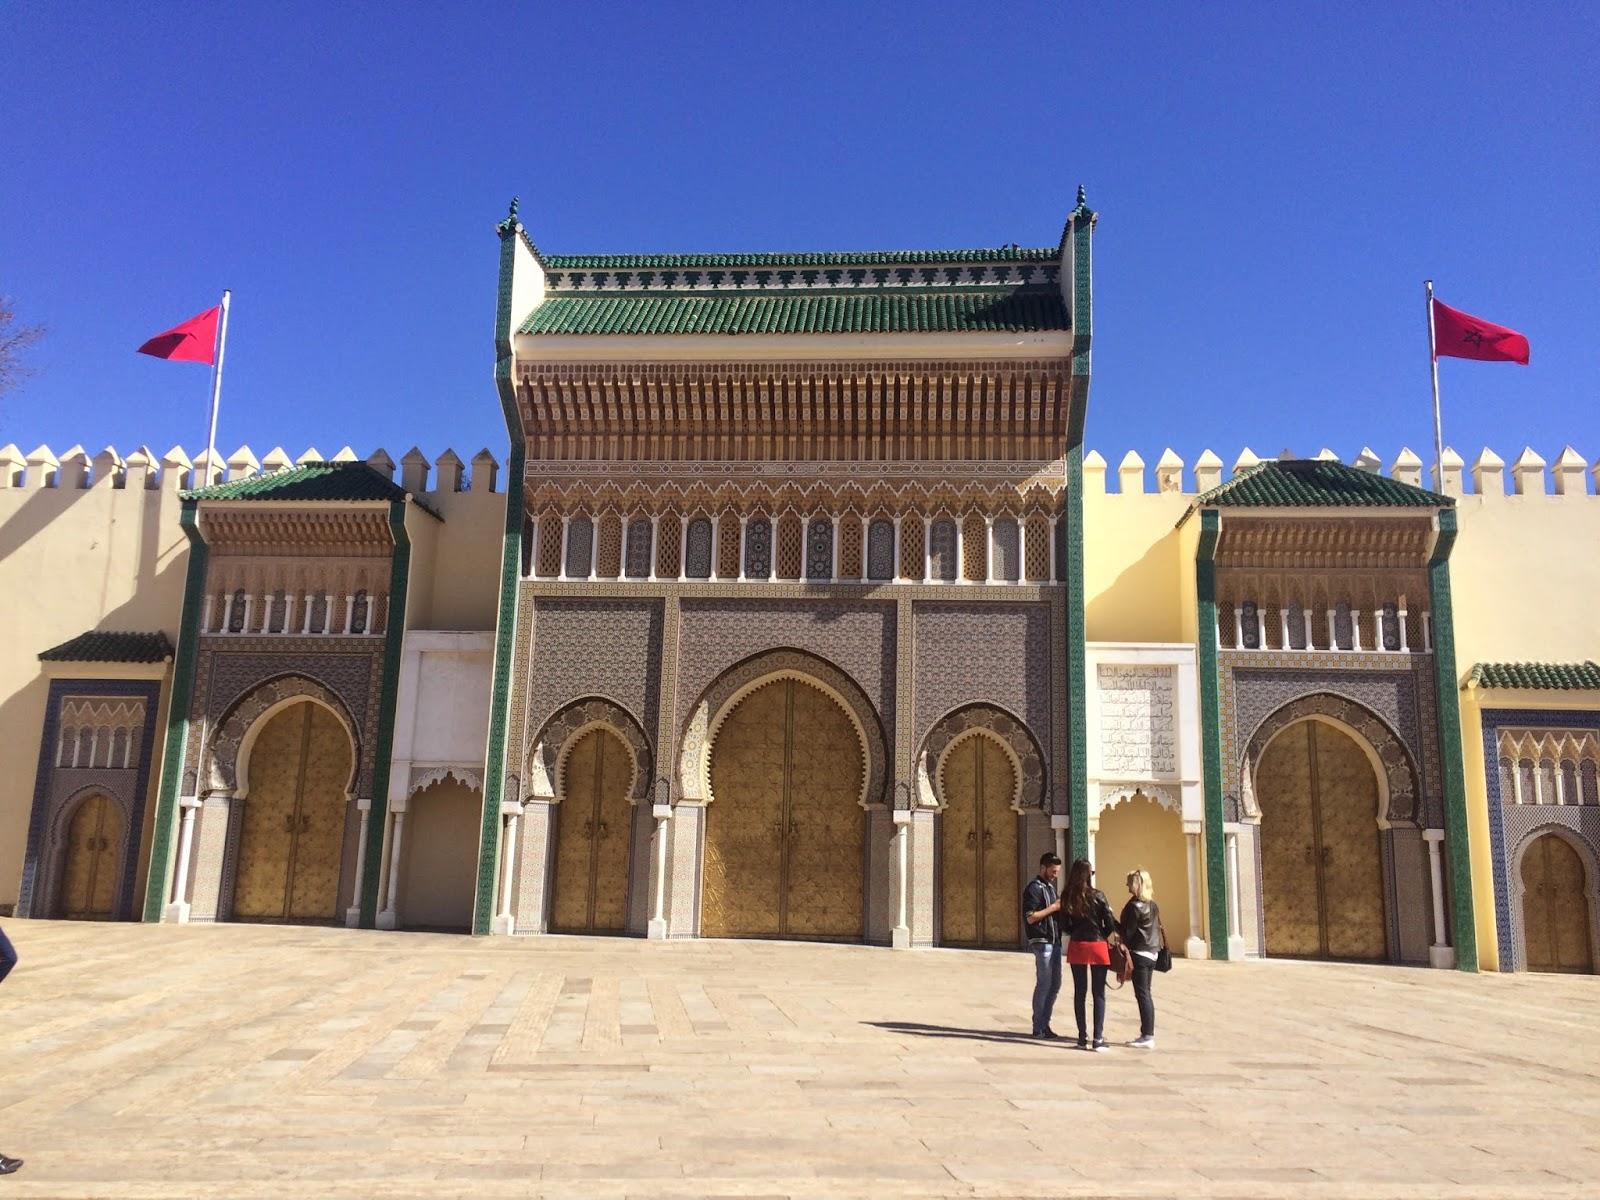 Fes Palace, Morocco, Marac